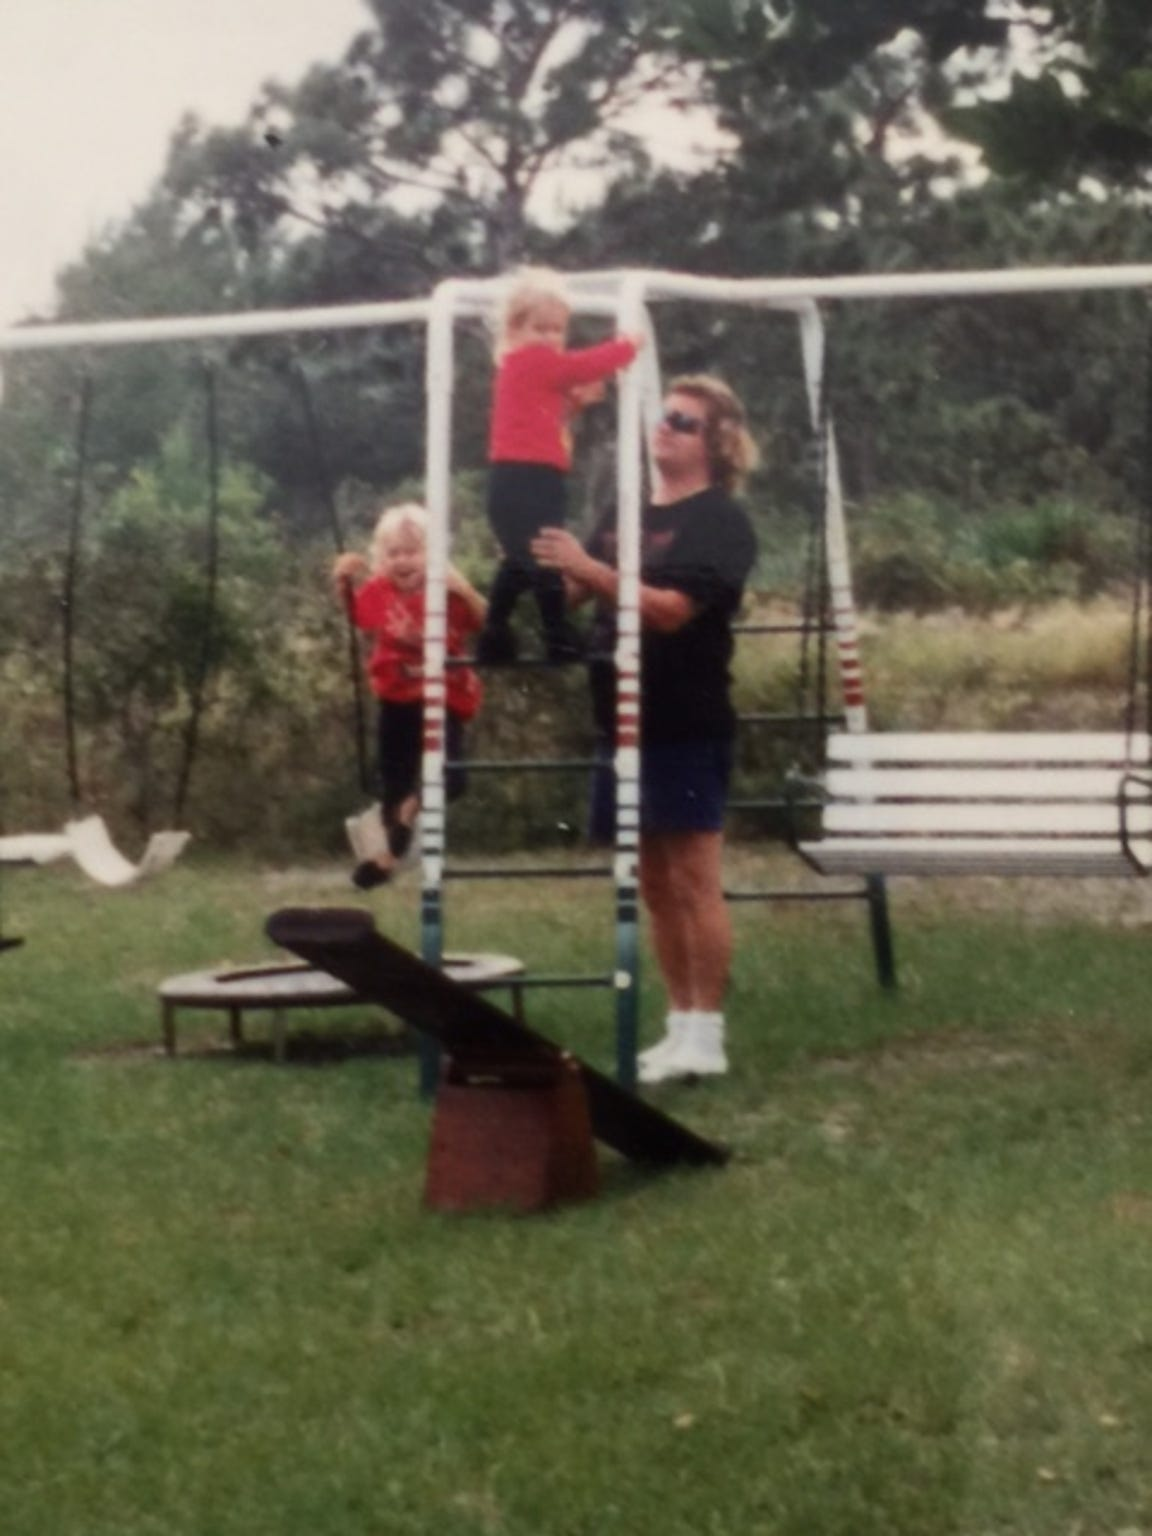 Jeff Abramowski plays with his children